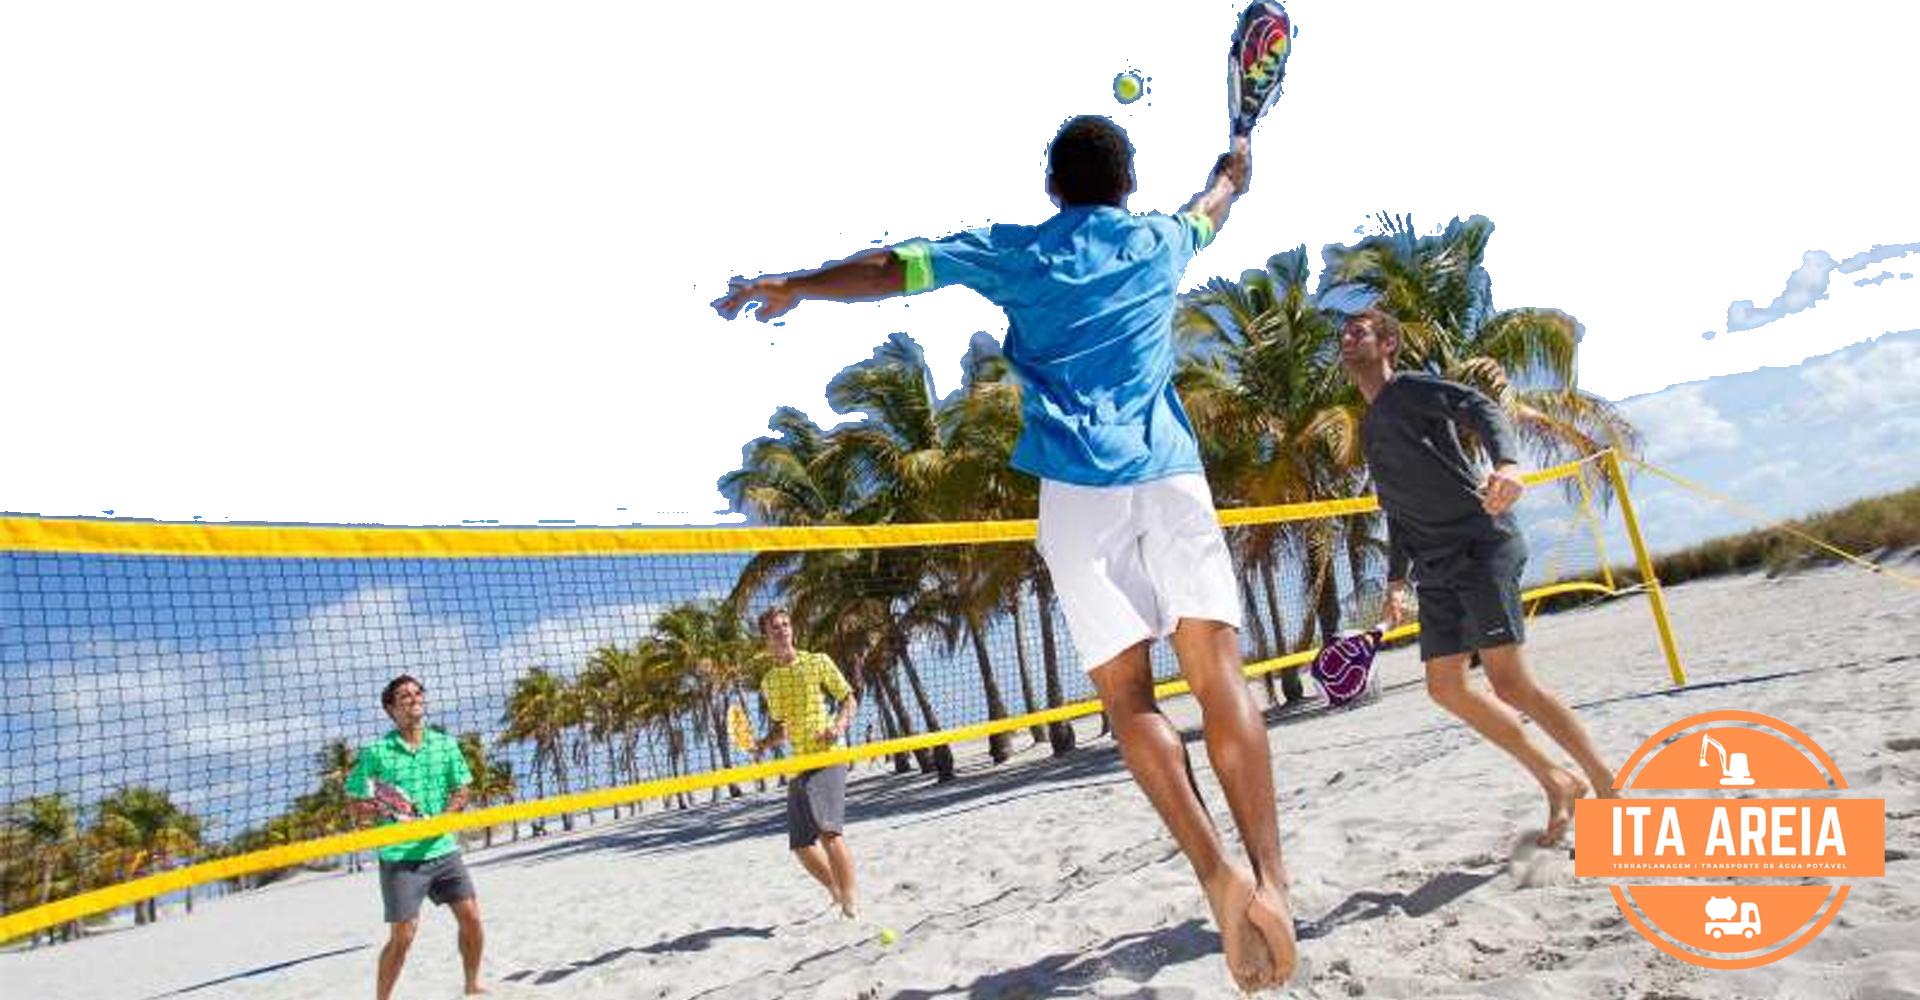 AREIA PARA BEACH TENNIS